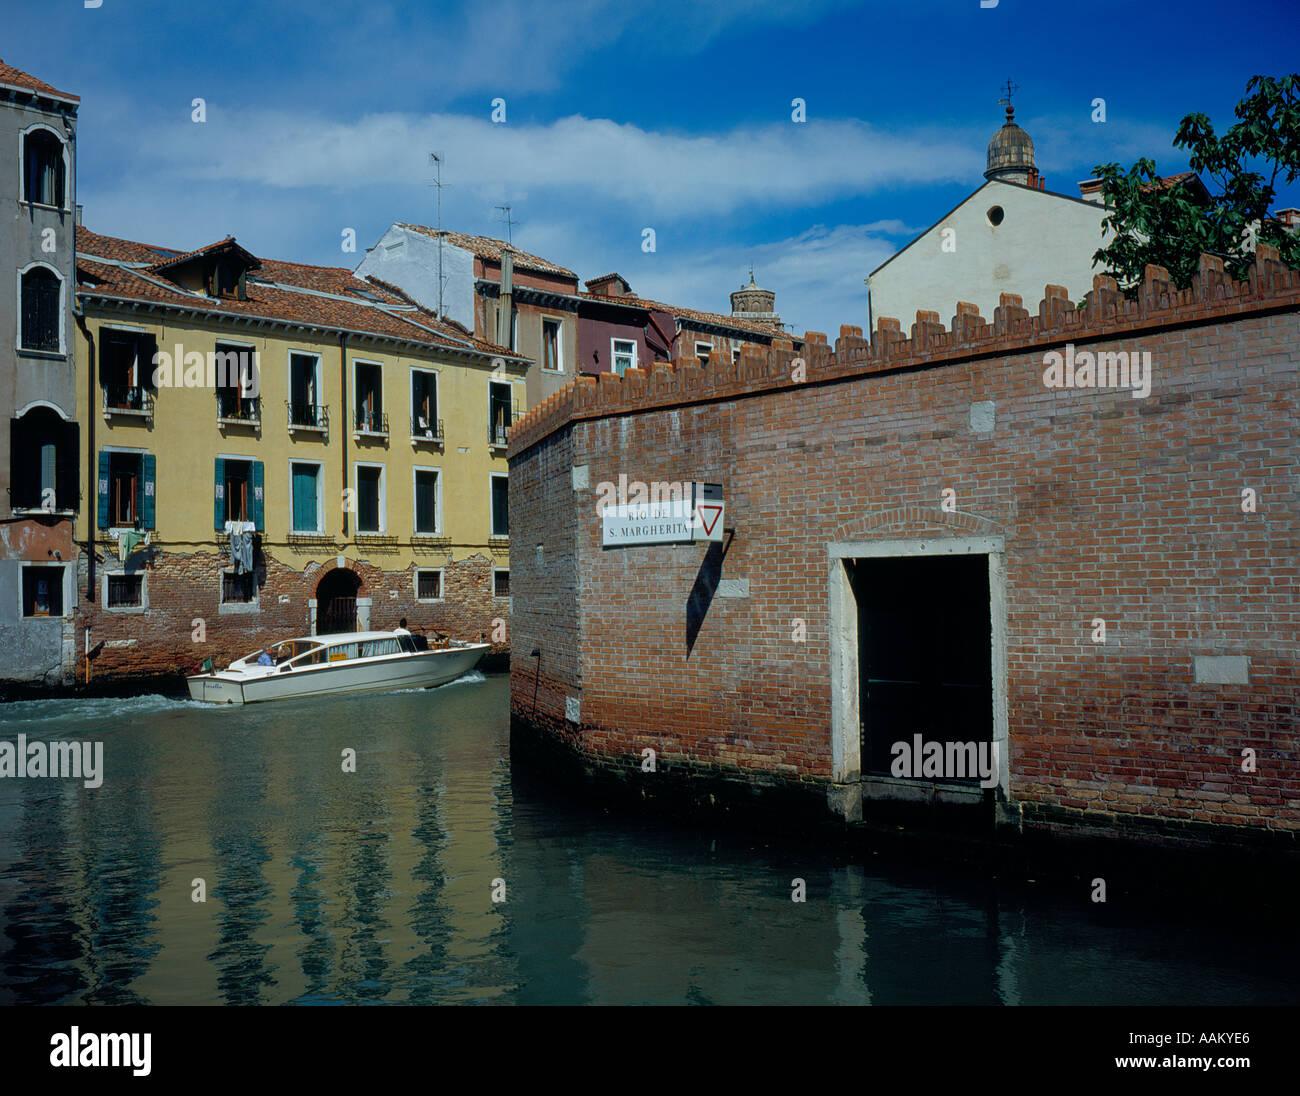 motorboat at Rio de Santa Margherita intersection Rio Nuovo, Venice, UNESCO World Heritage Site, Italy, Europe. - Stock Image